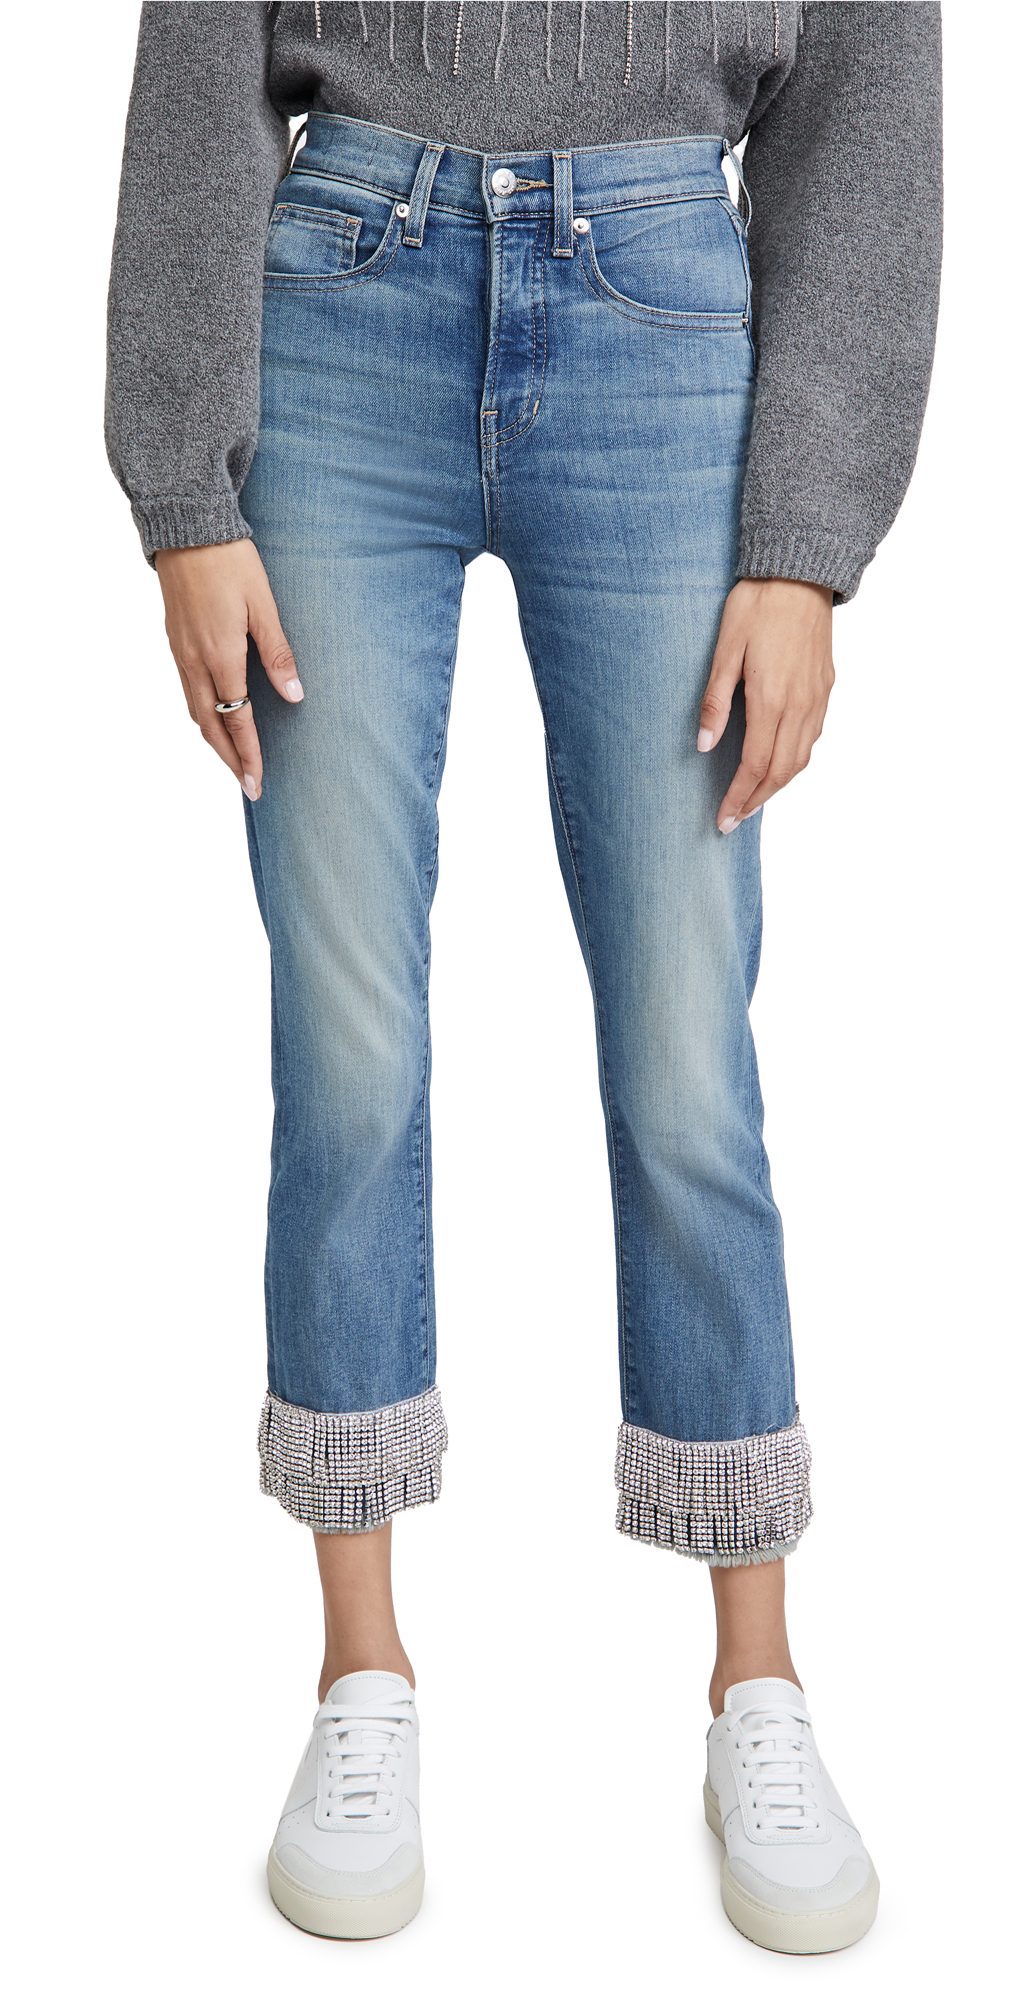 Veronica Beard Jean Ryleigh Pants with Fringe Rhinestone